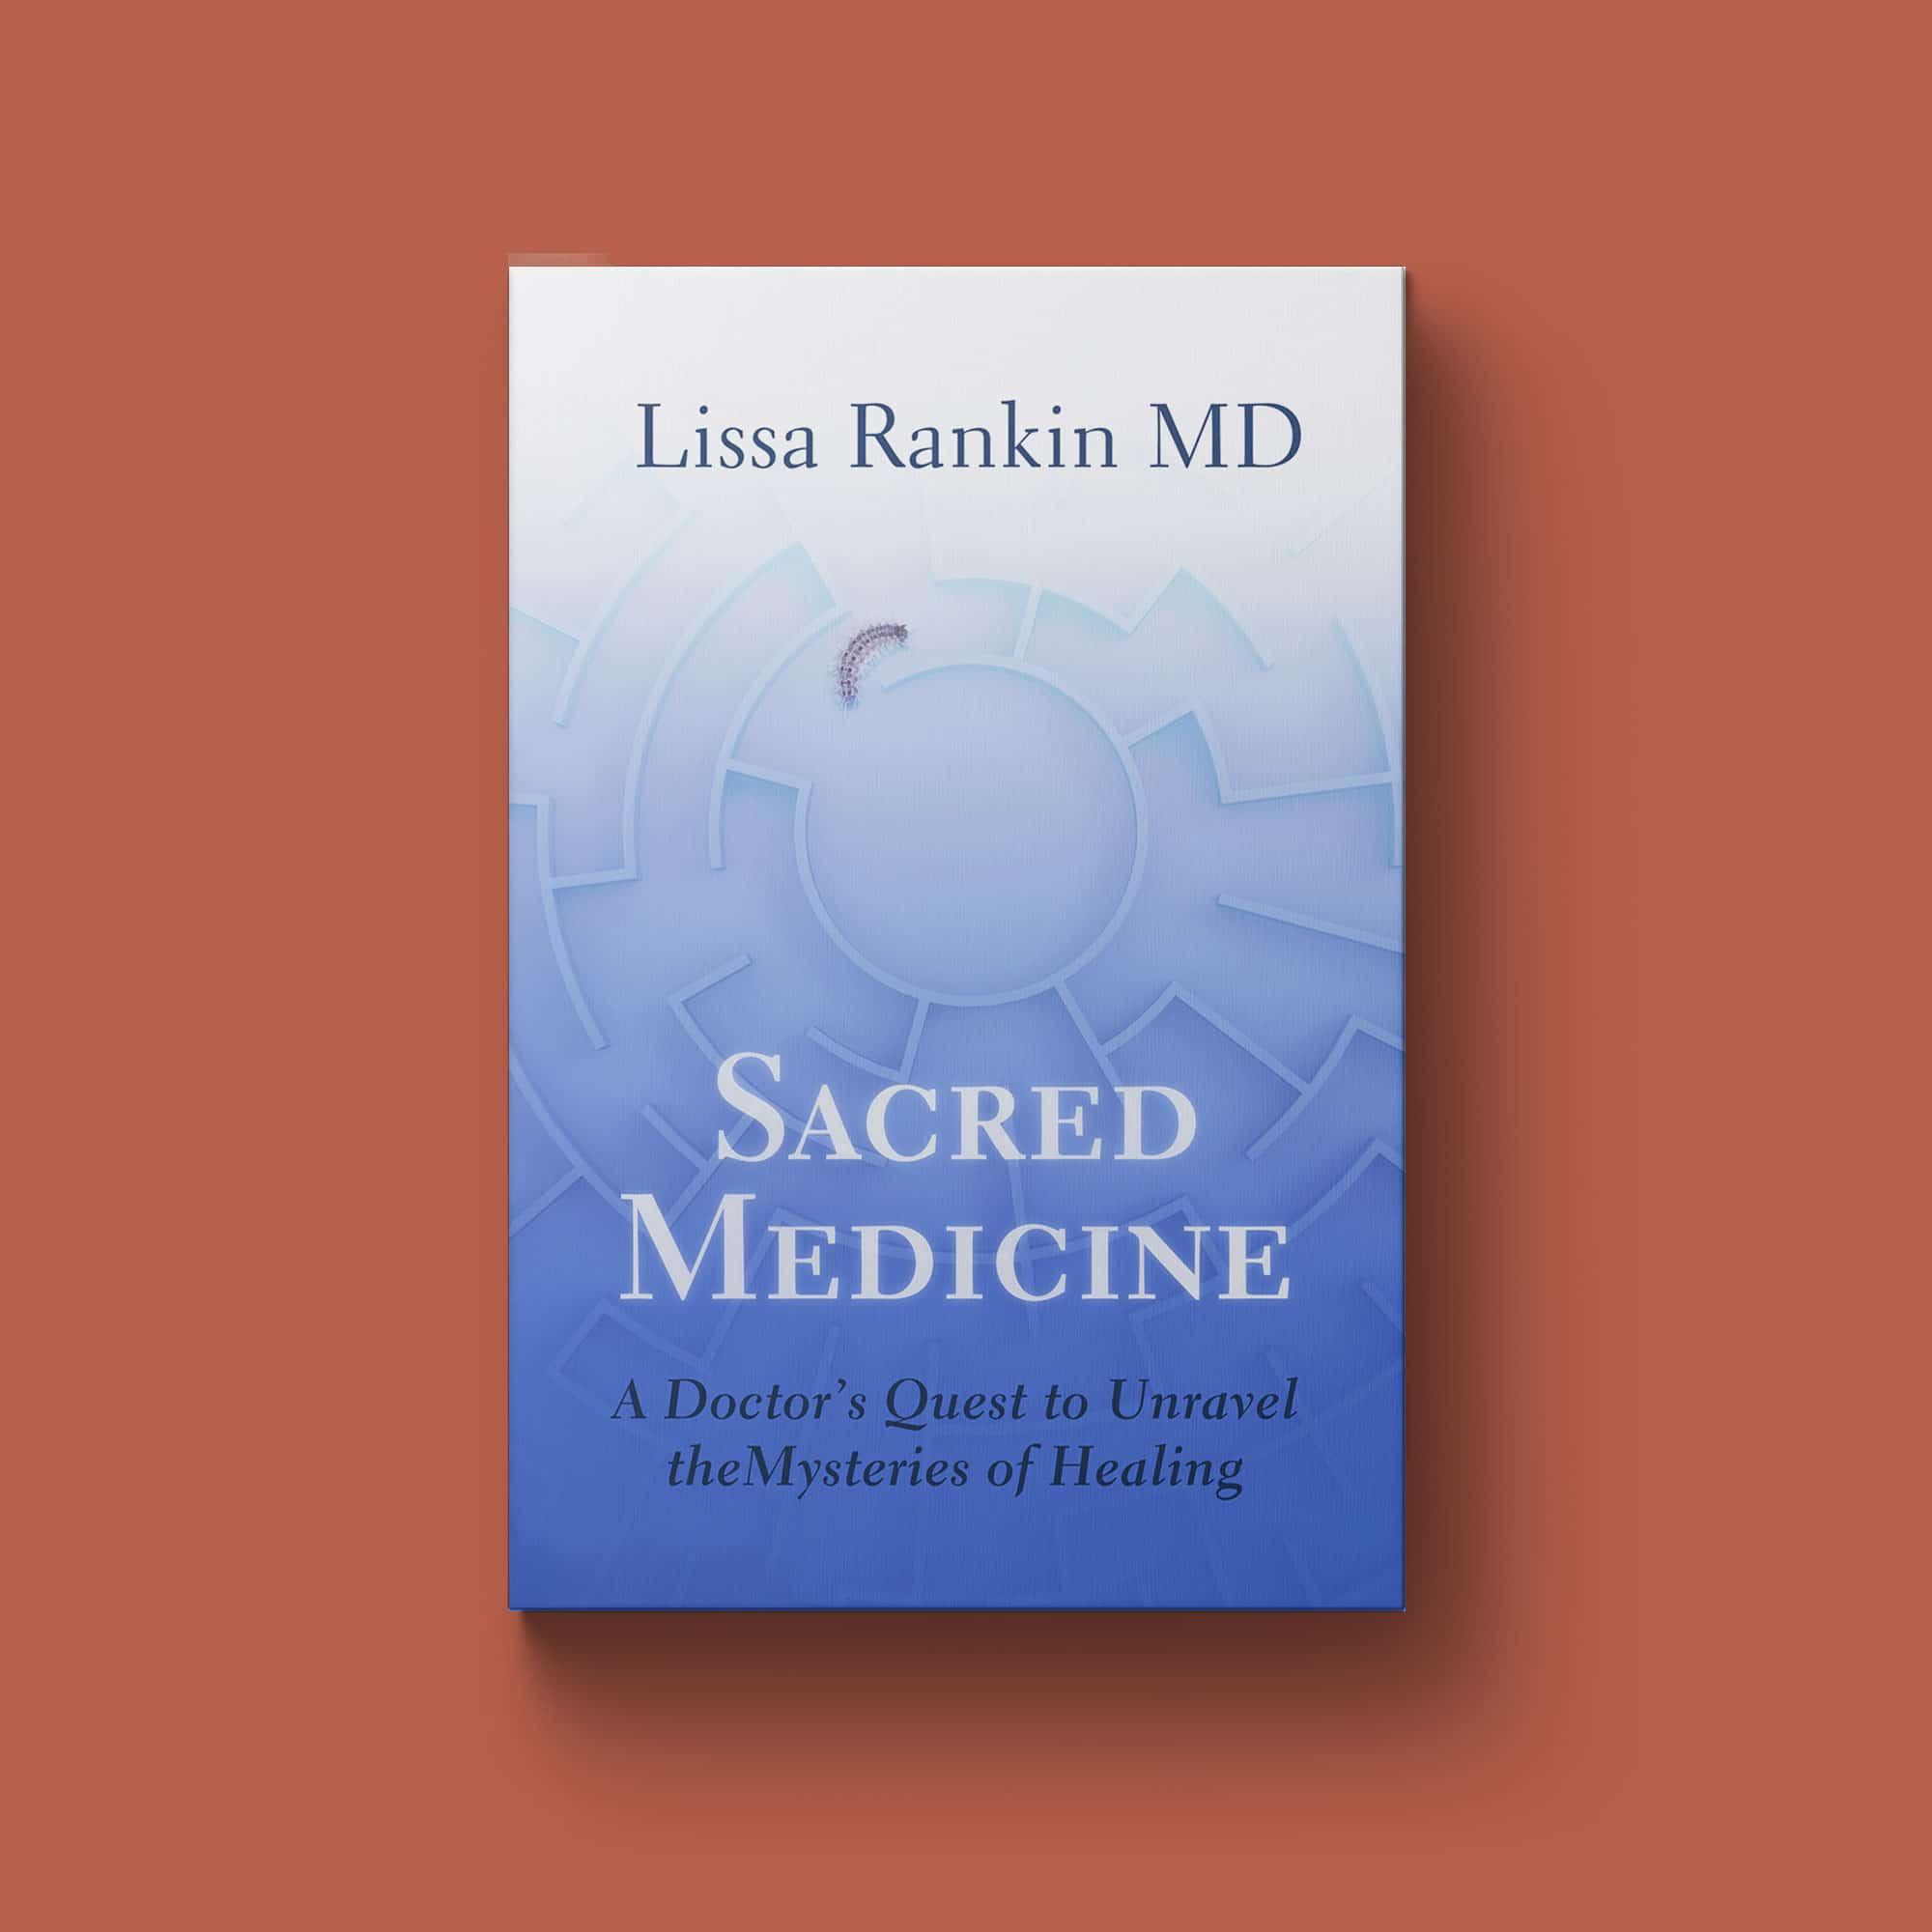 sacred-medicine-cover-concept